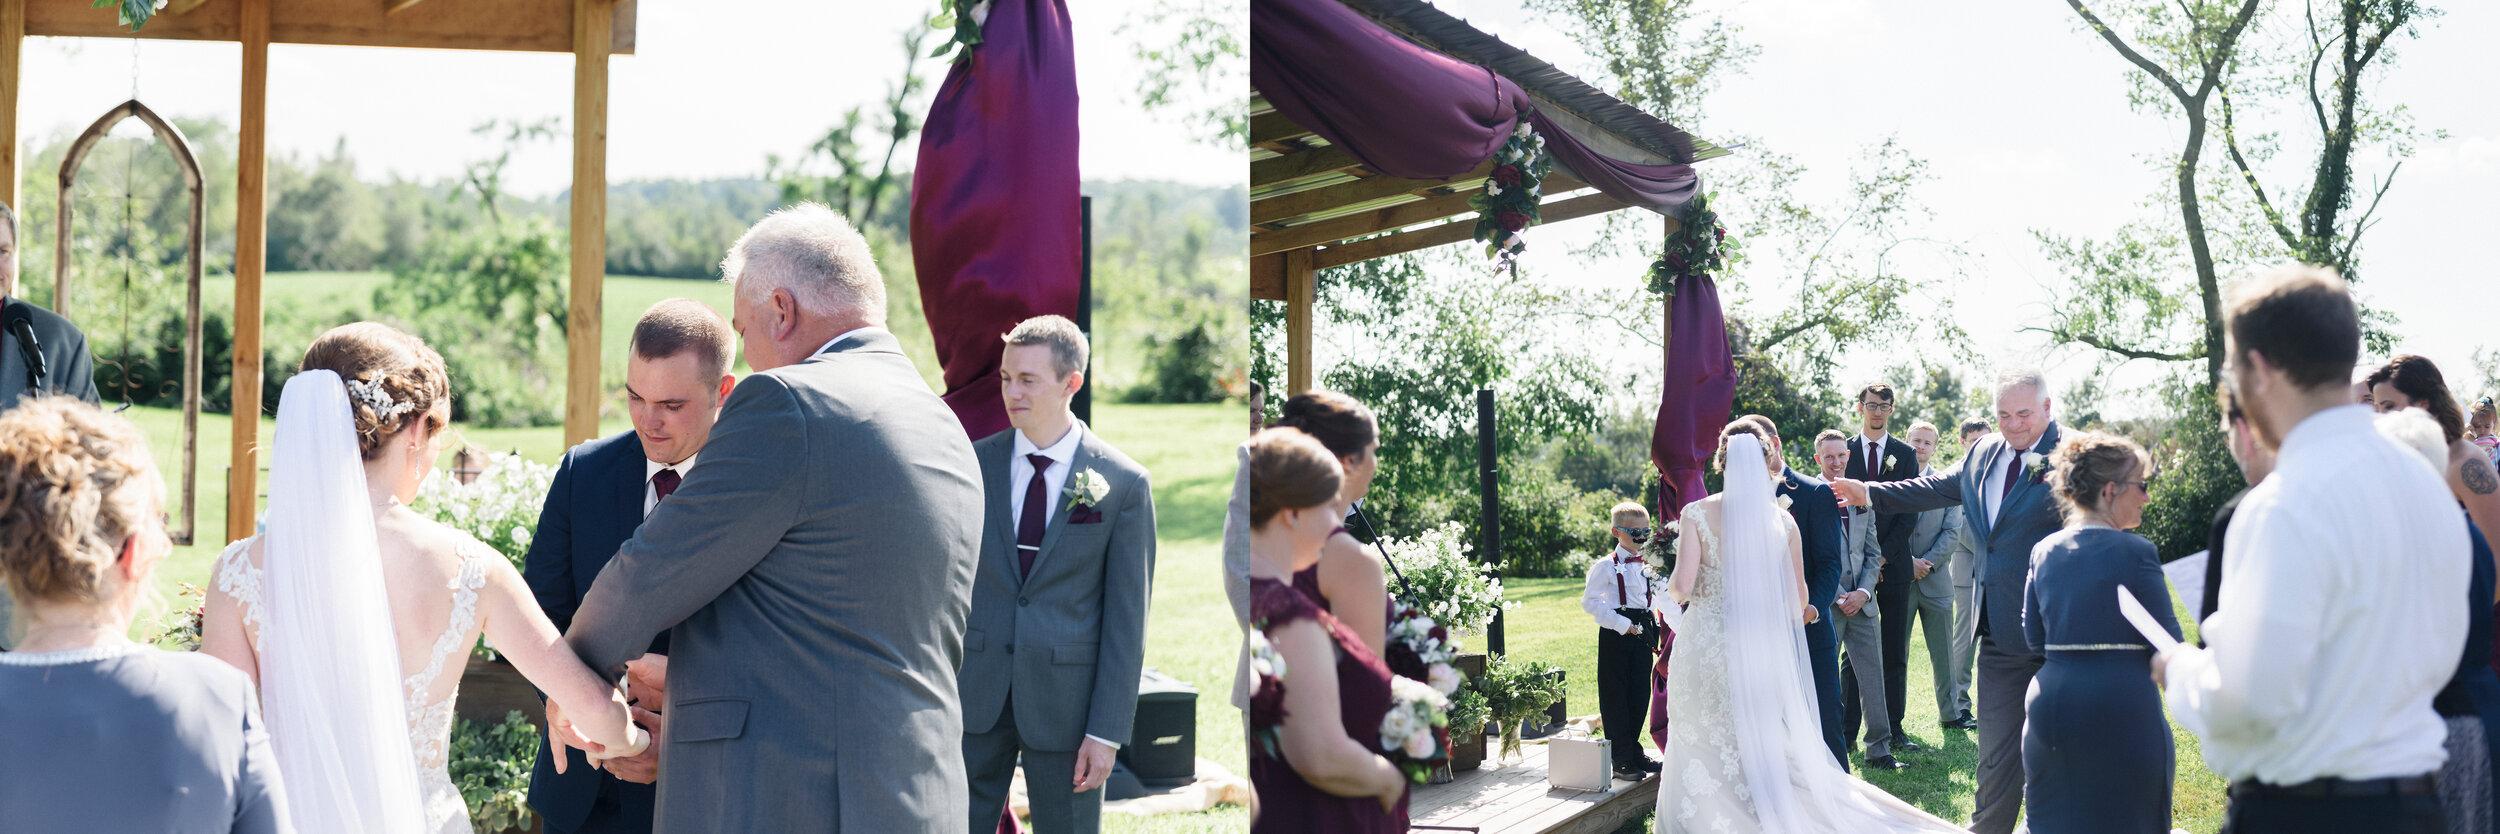 Ceremony04.jpg